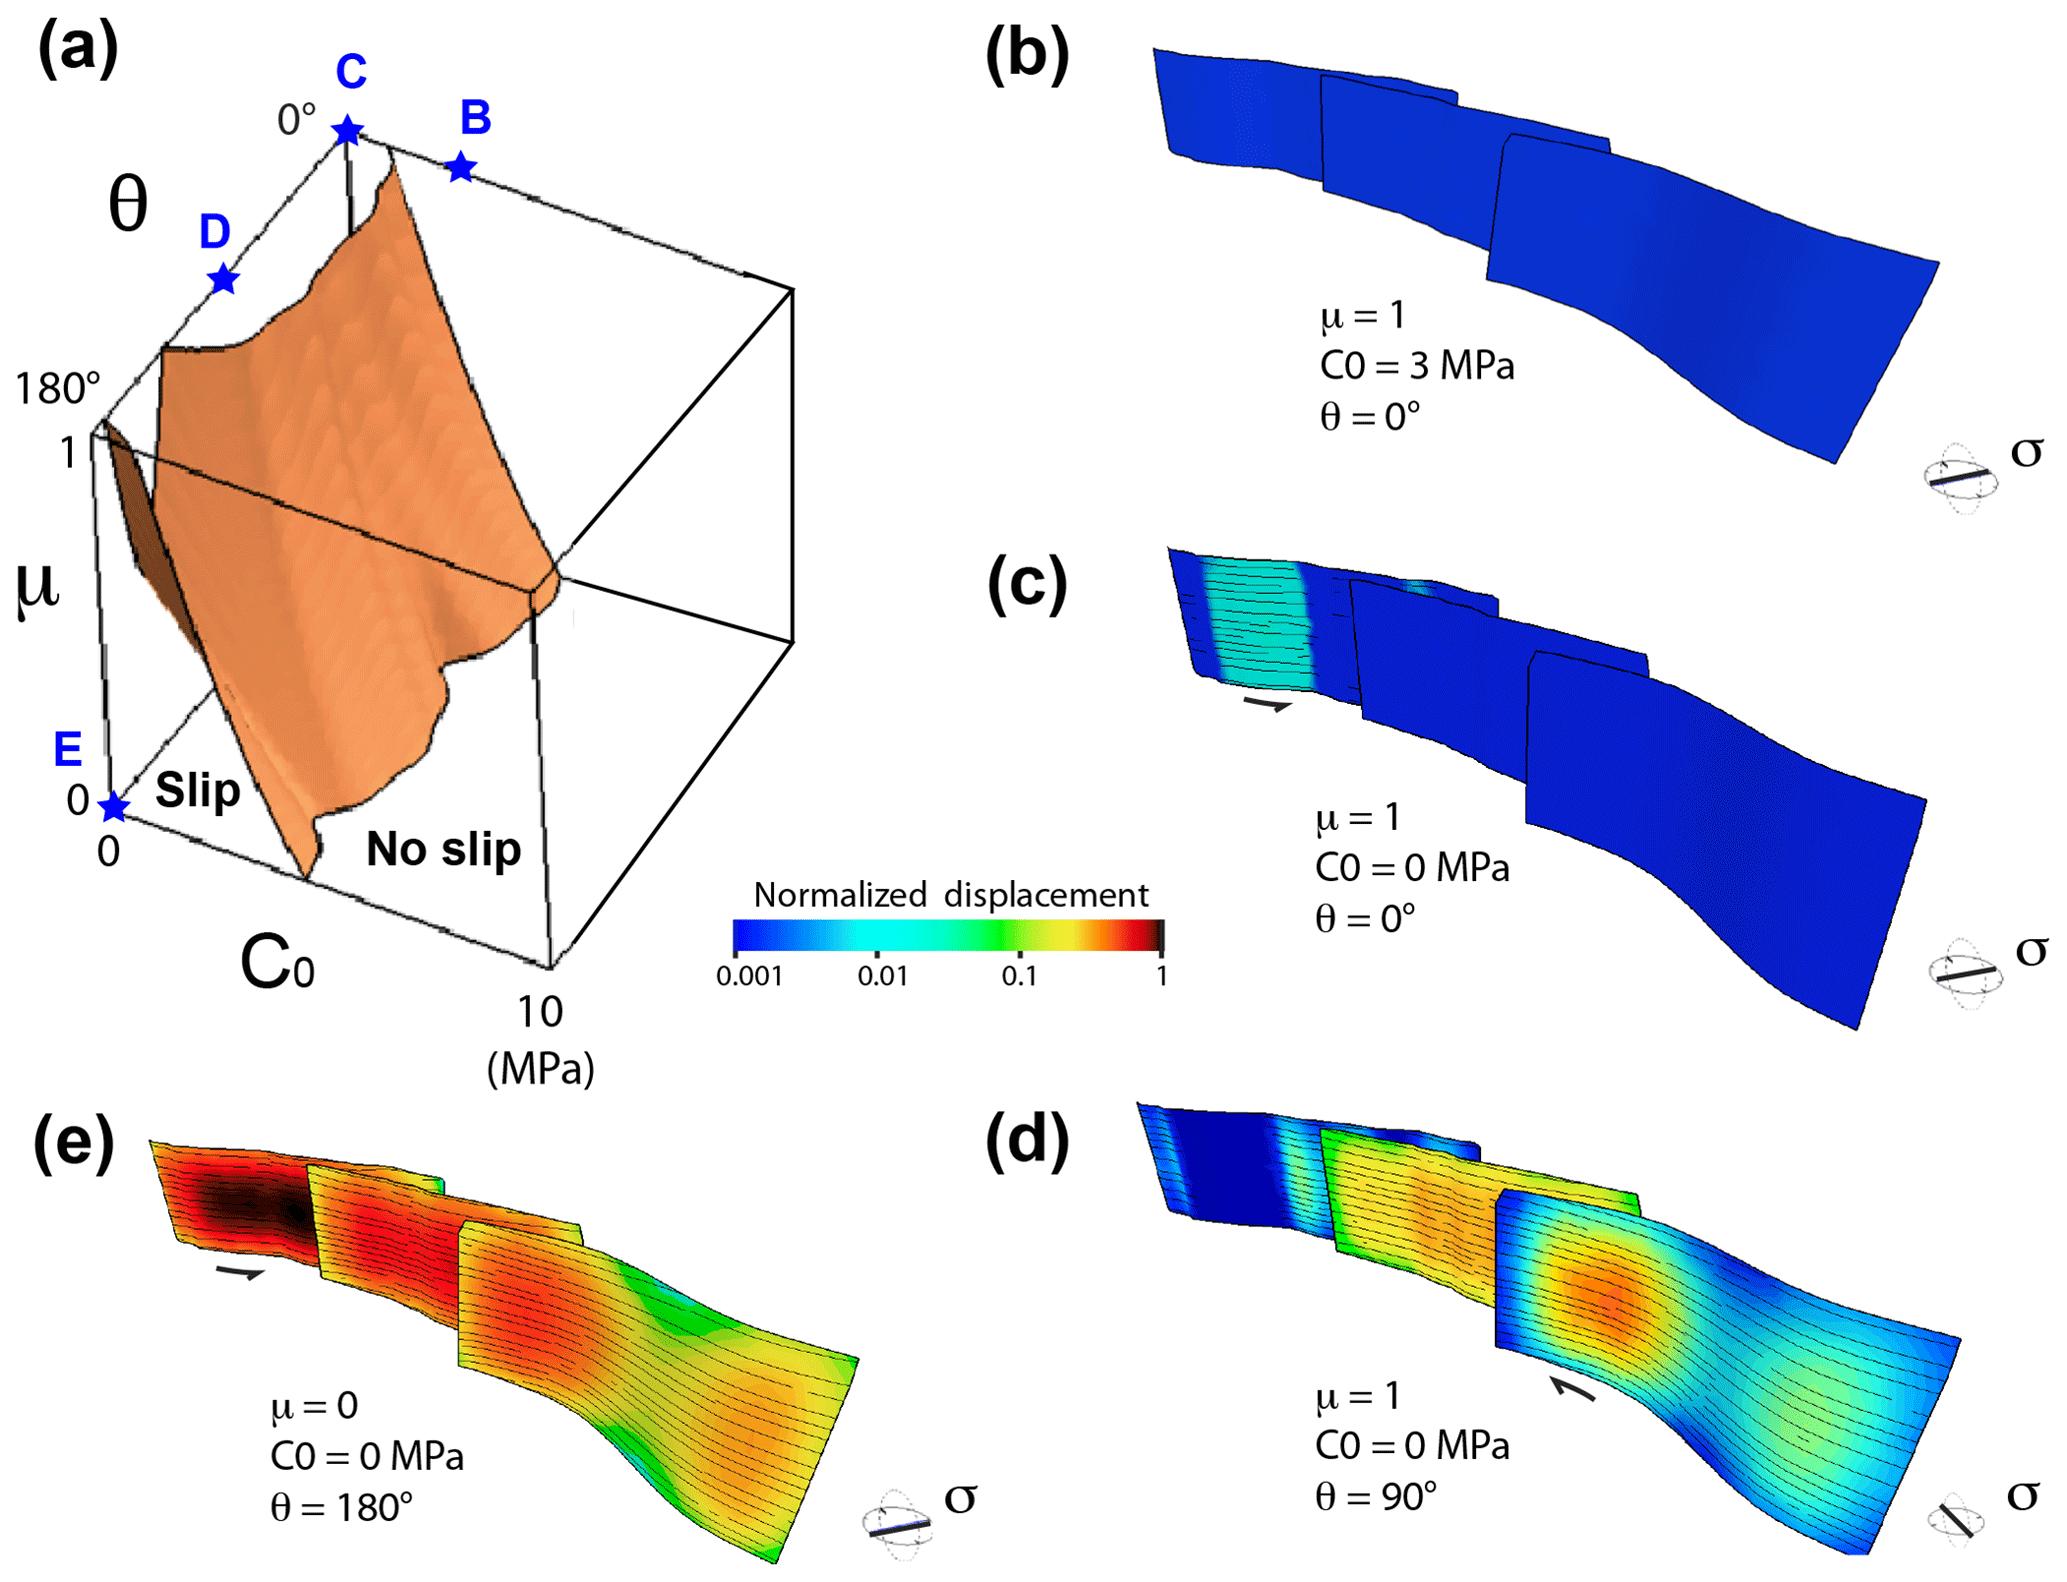 SE - Fault slip envelope: a new parametric investigation